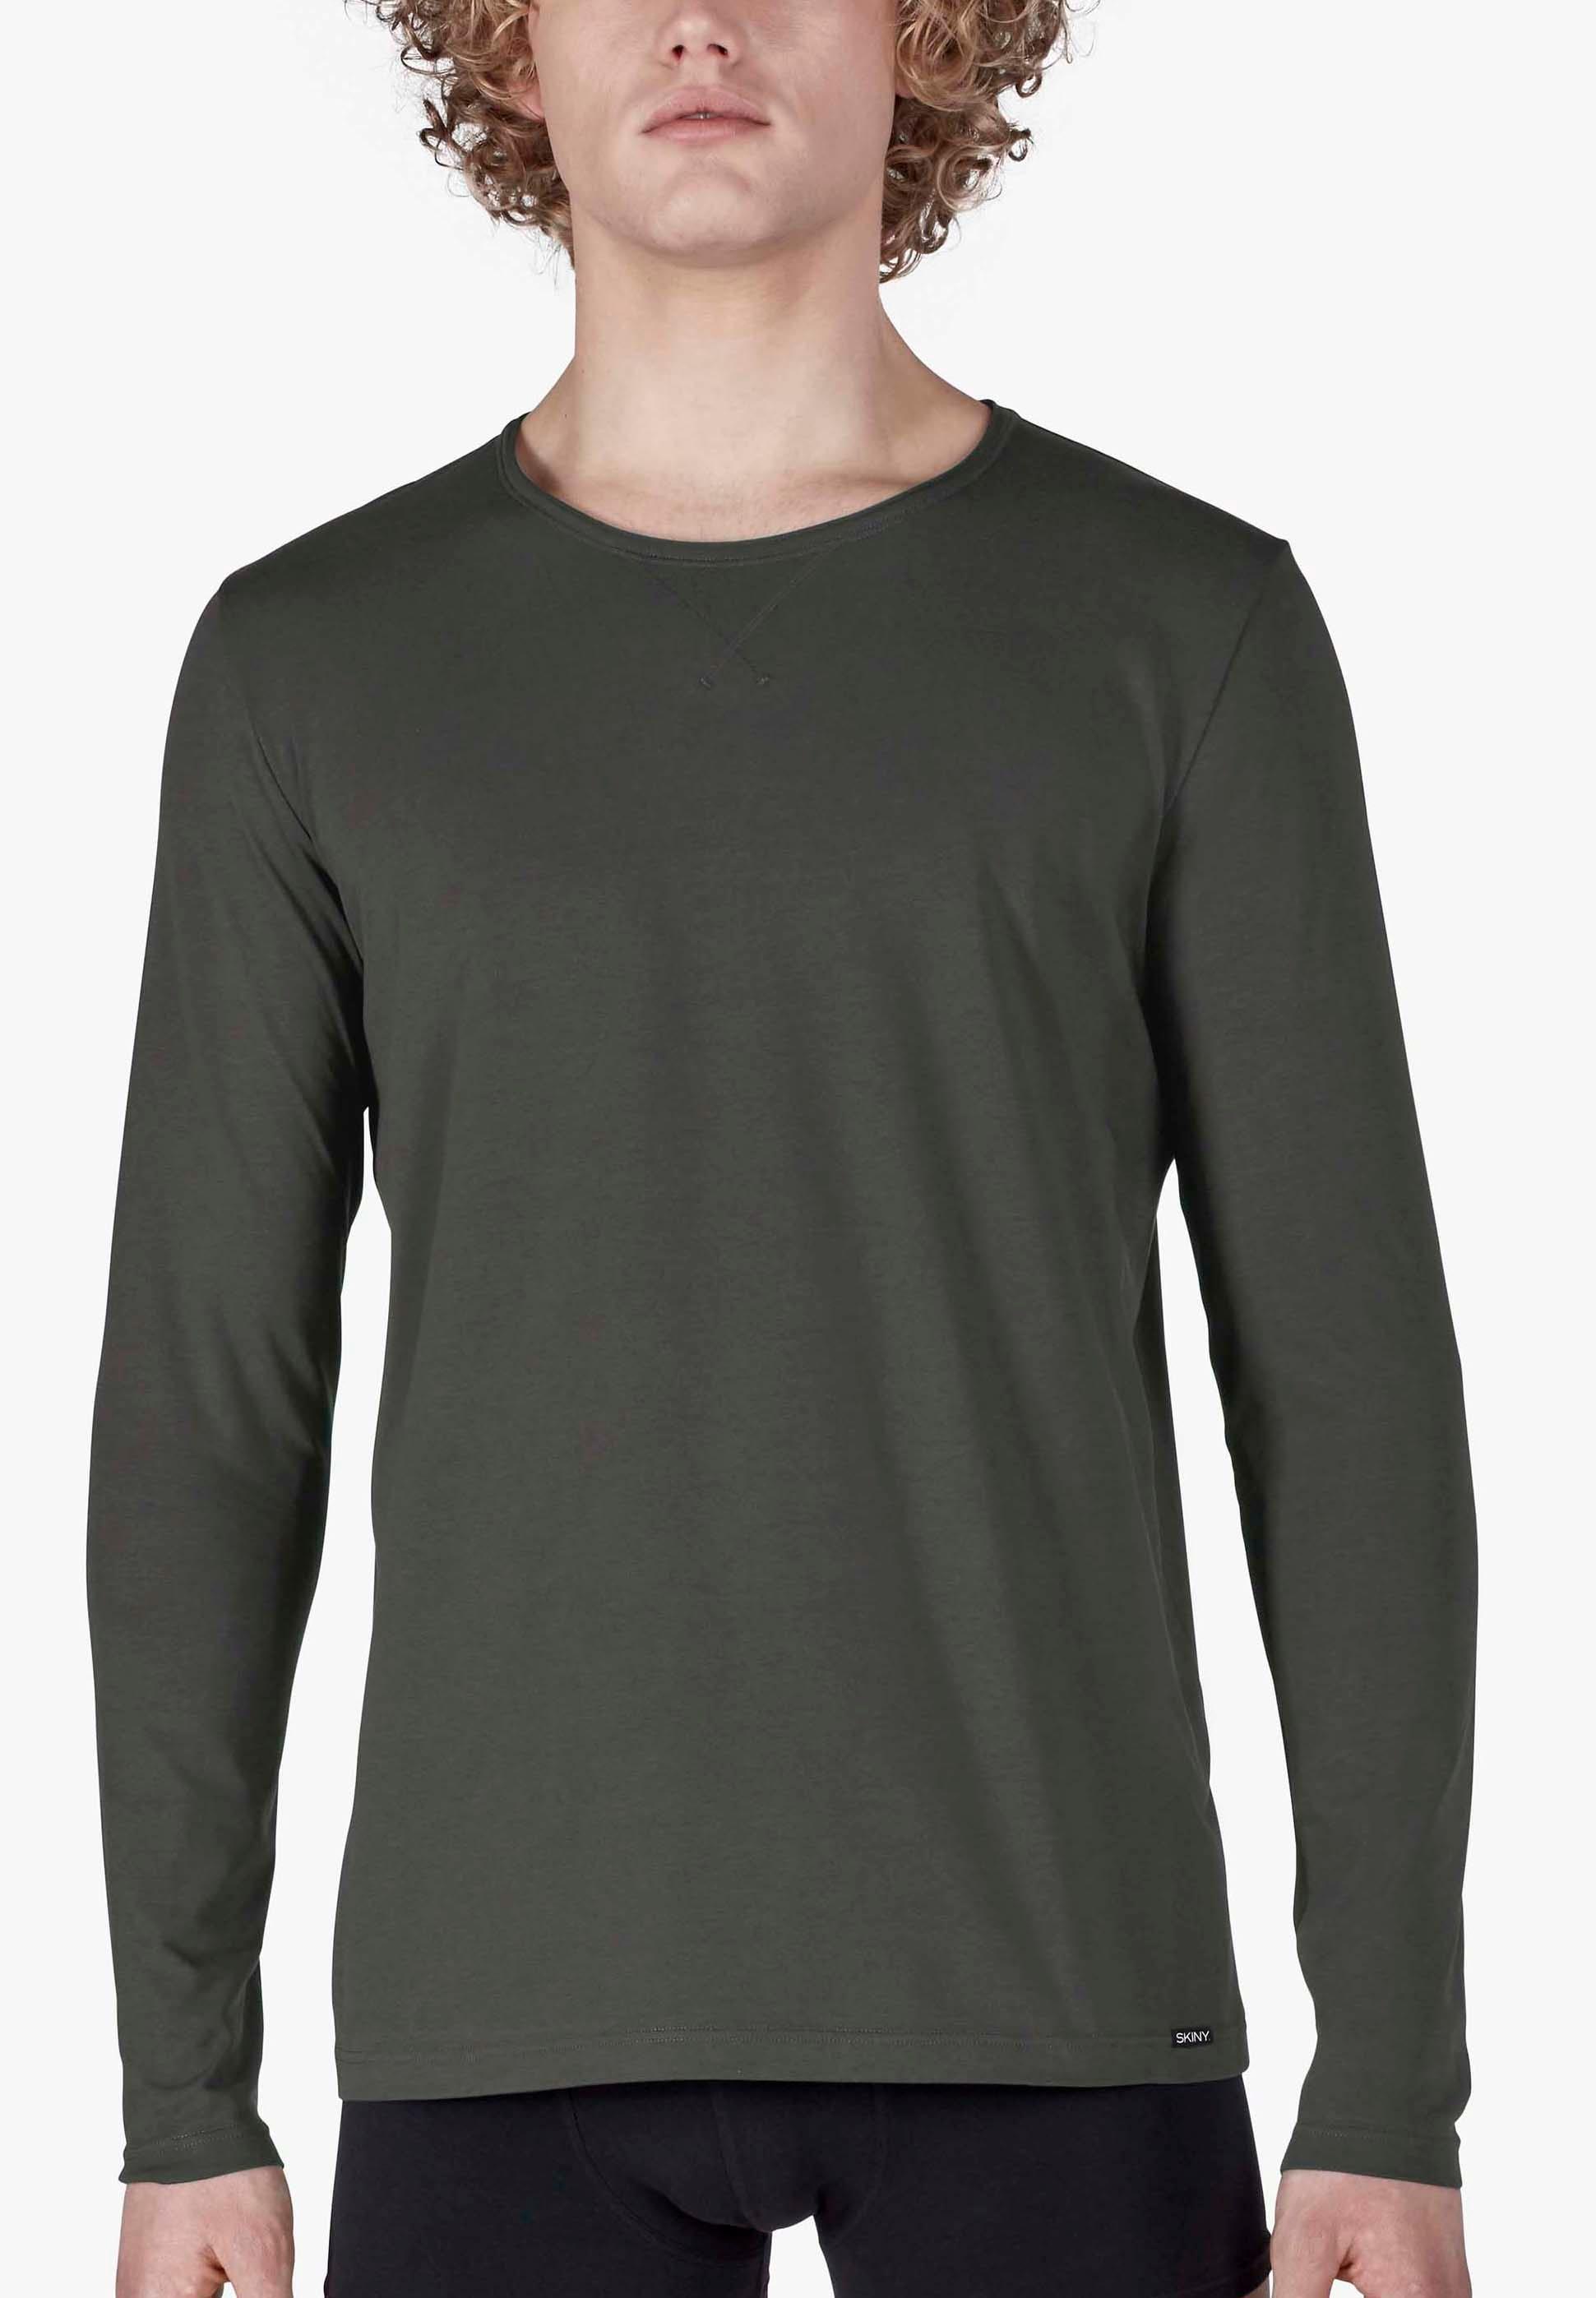 skiny -  Langarmshirt mit modernem X-Stitching Sloungewear